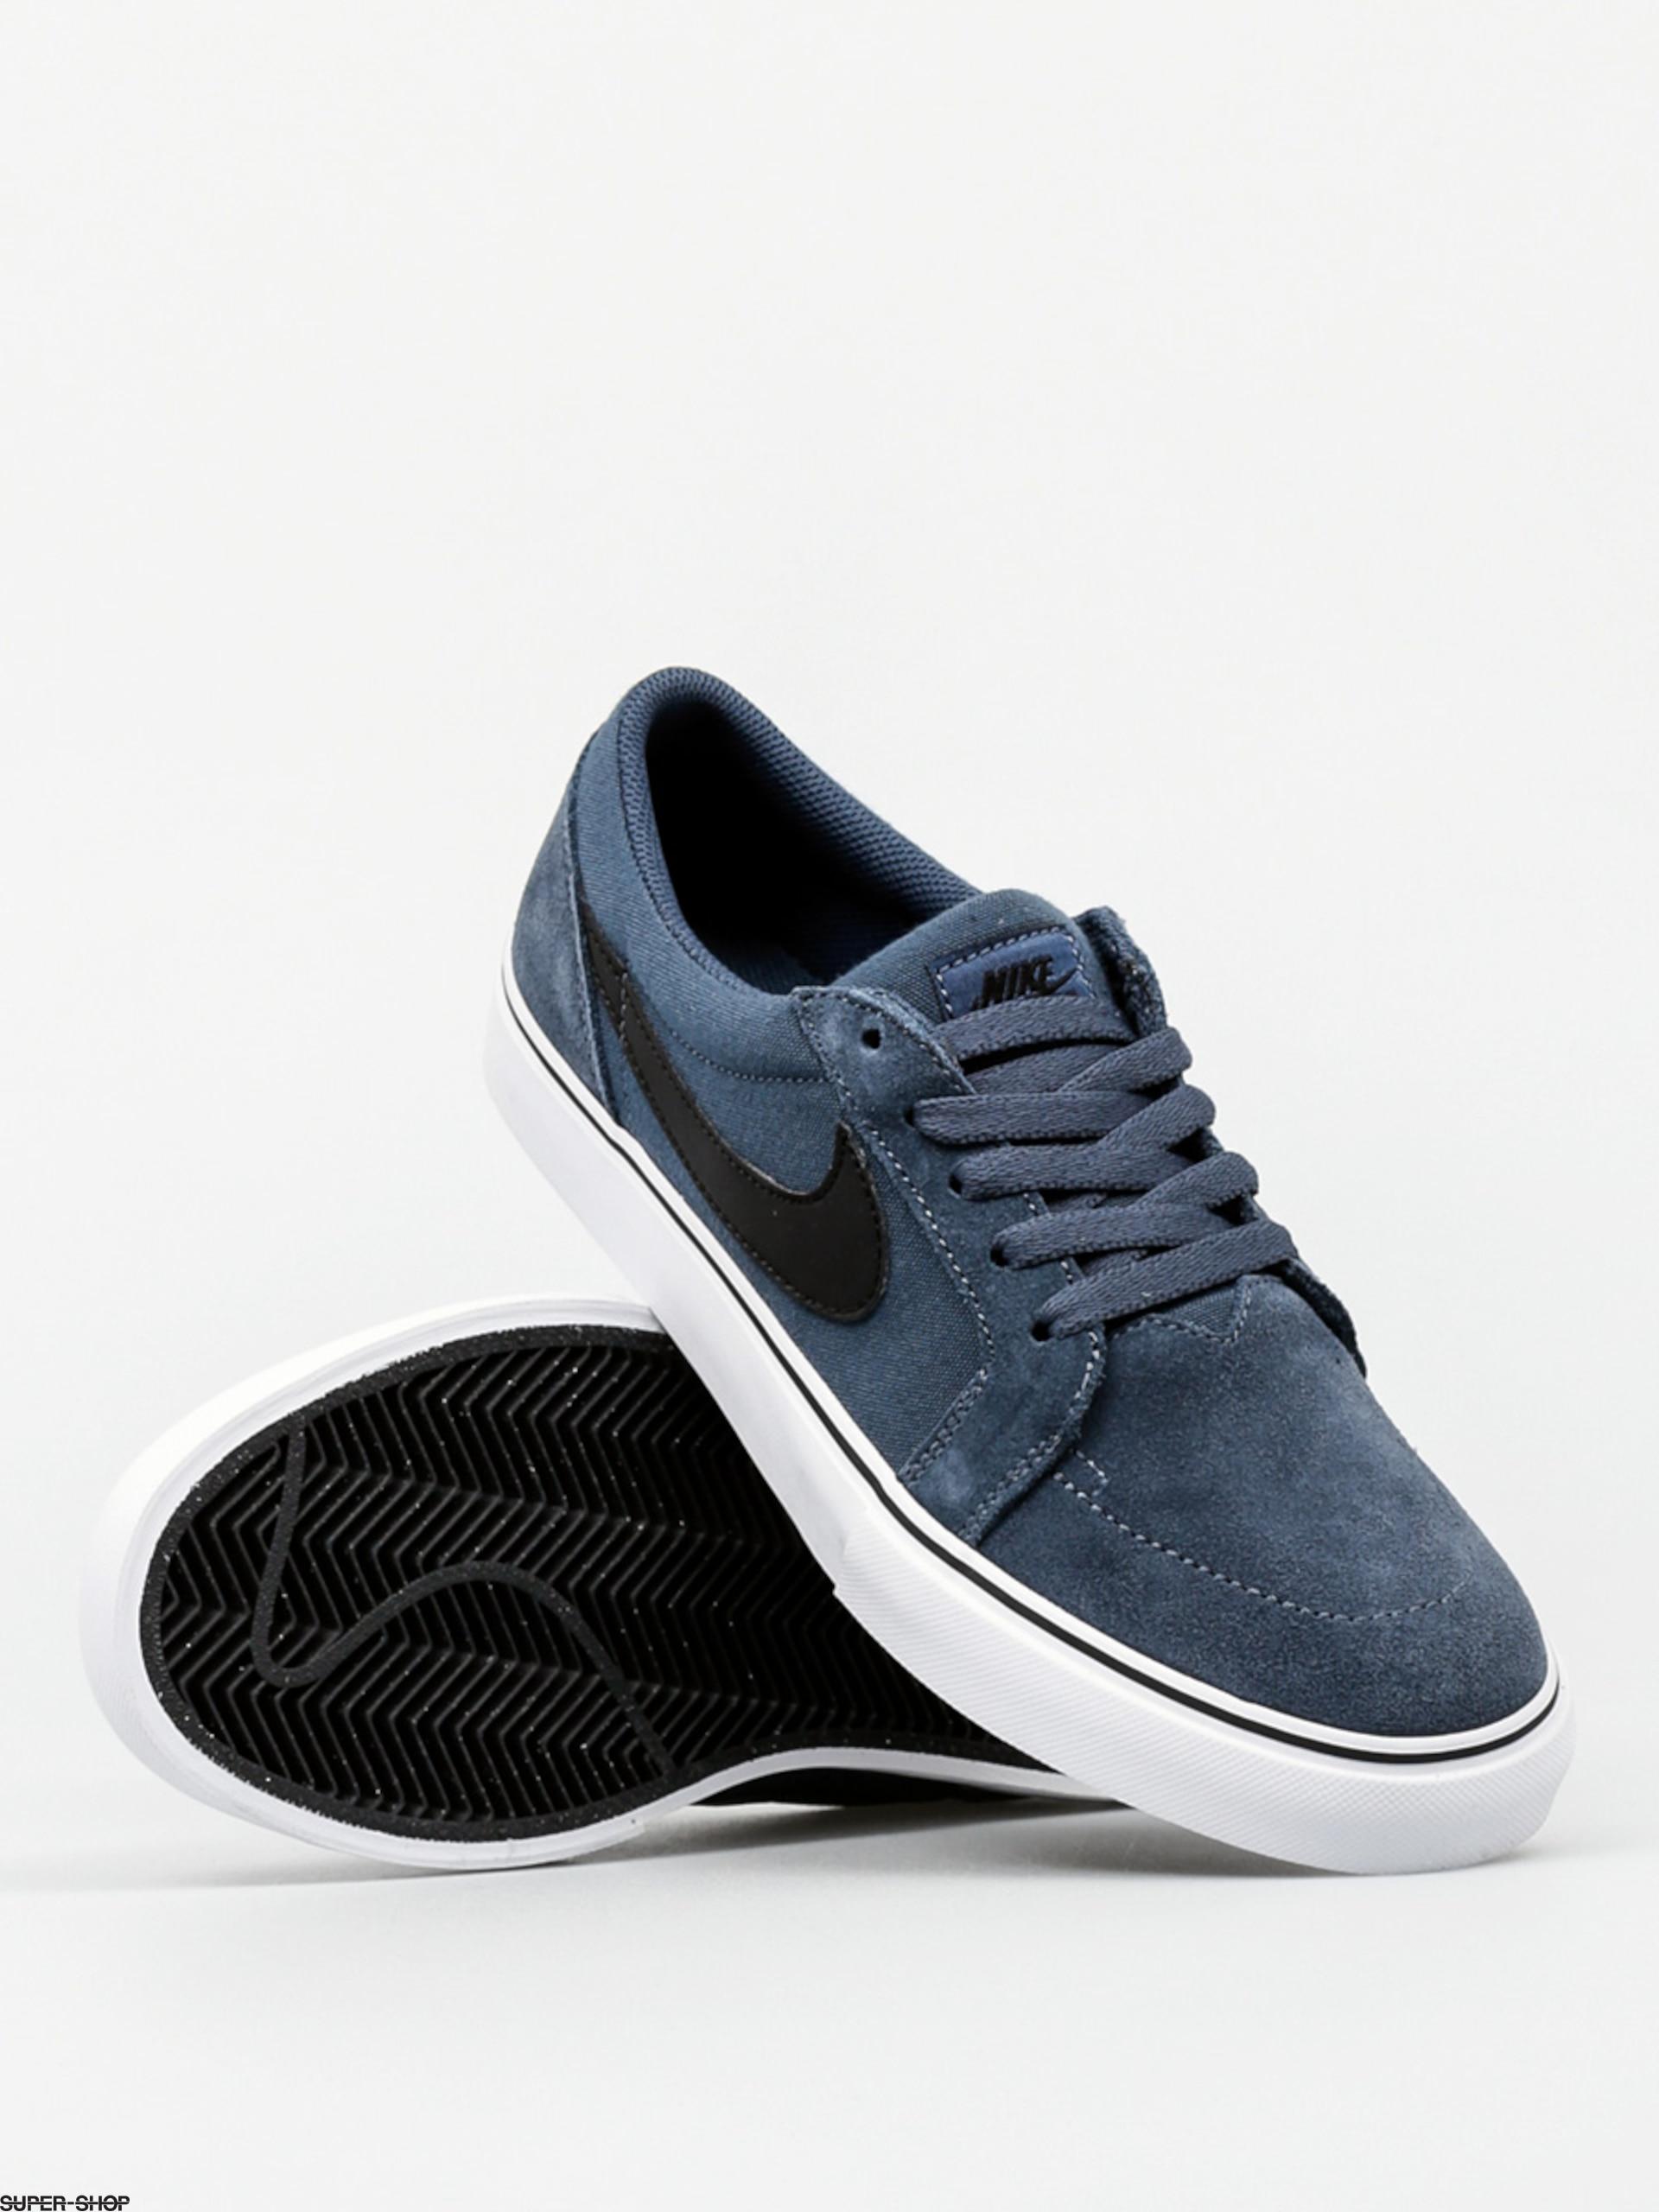 Nike Sb Shoes Sb Satire Ii Squadron Blue Black White